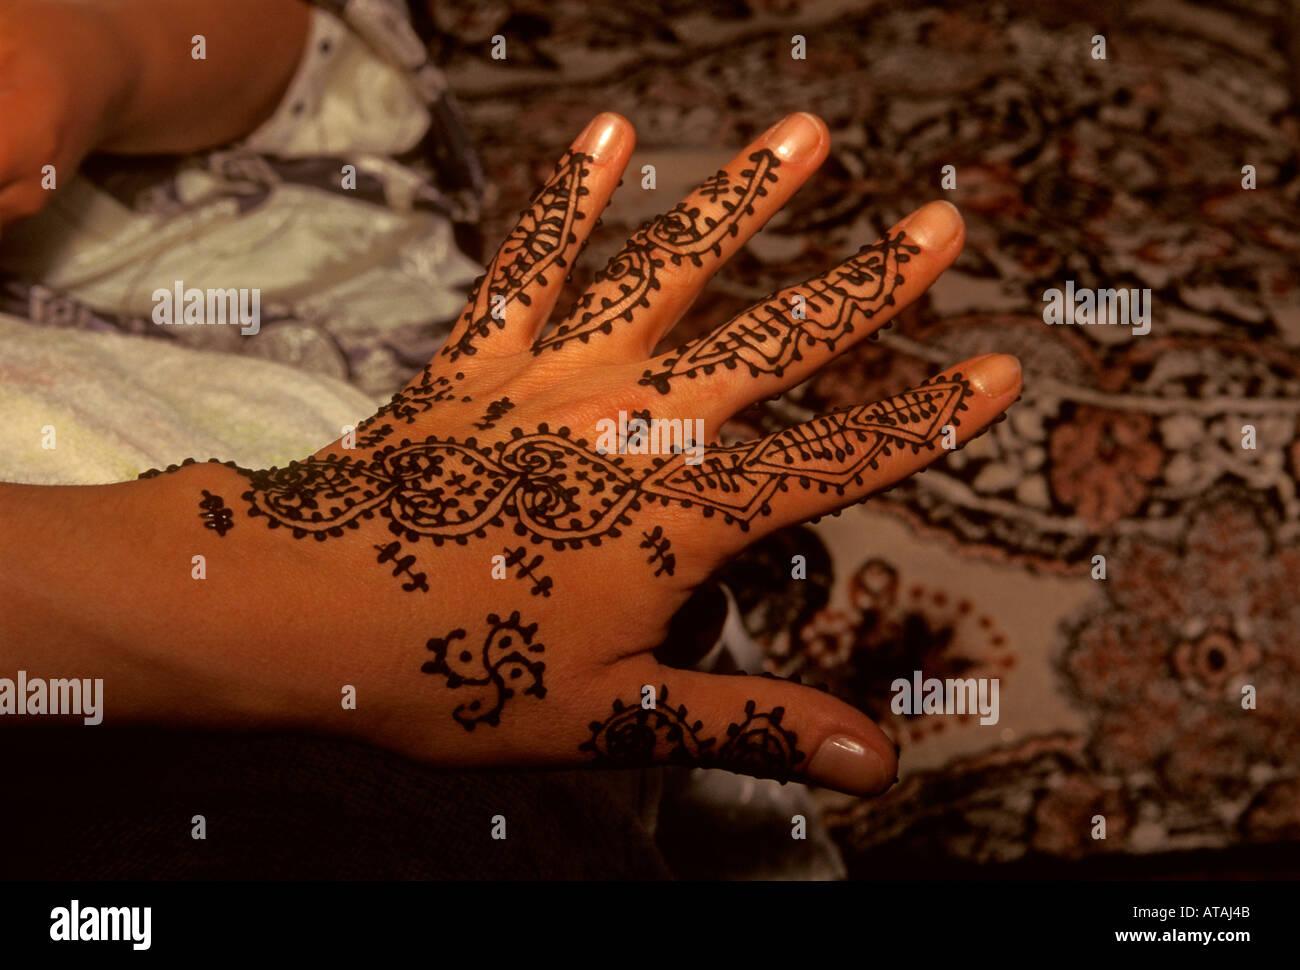 henna henna tattoos tatooing skin